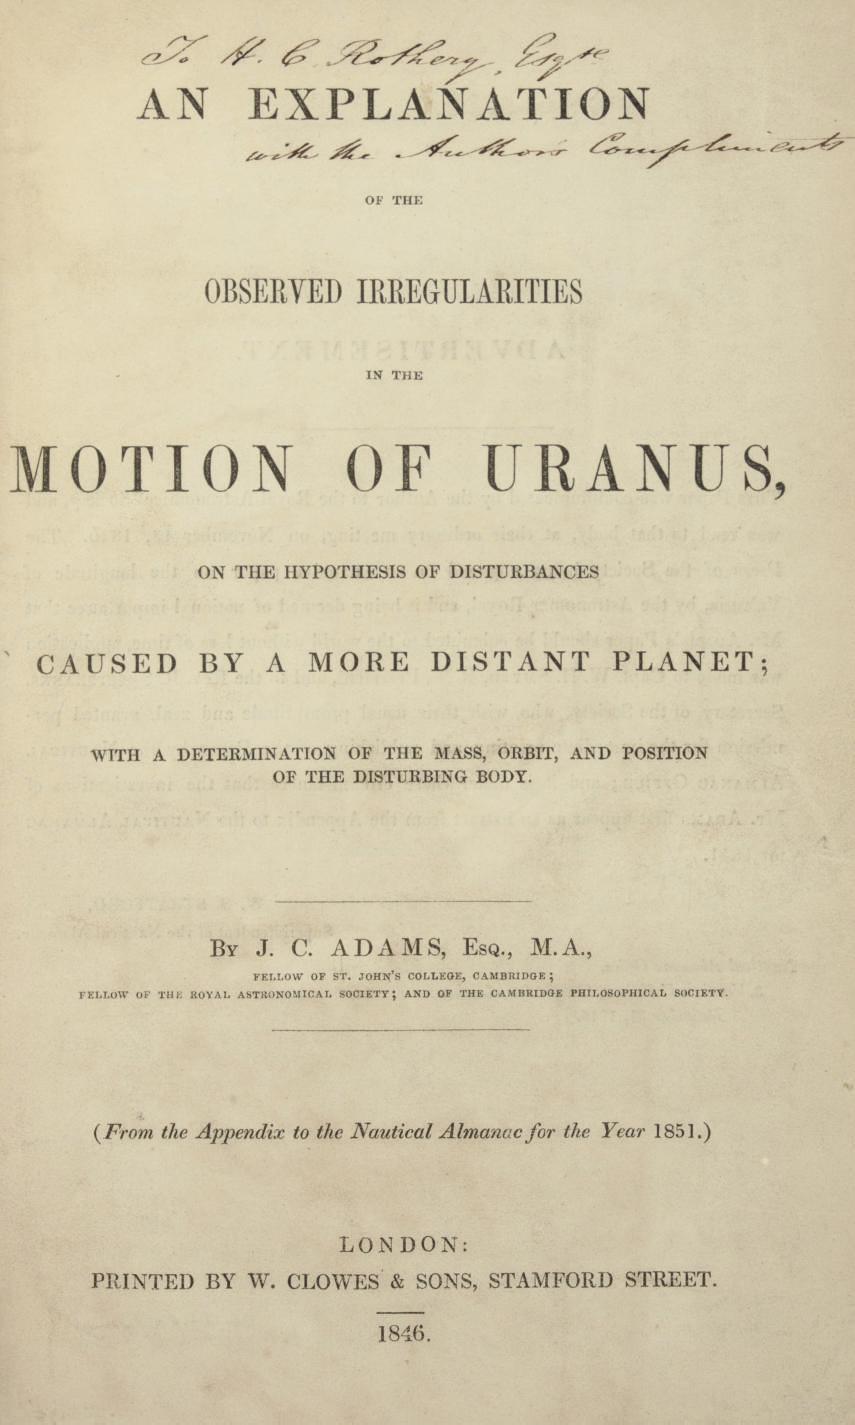 ADAMS, John Crouch (1819-1892)